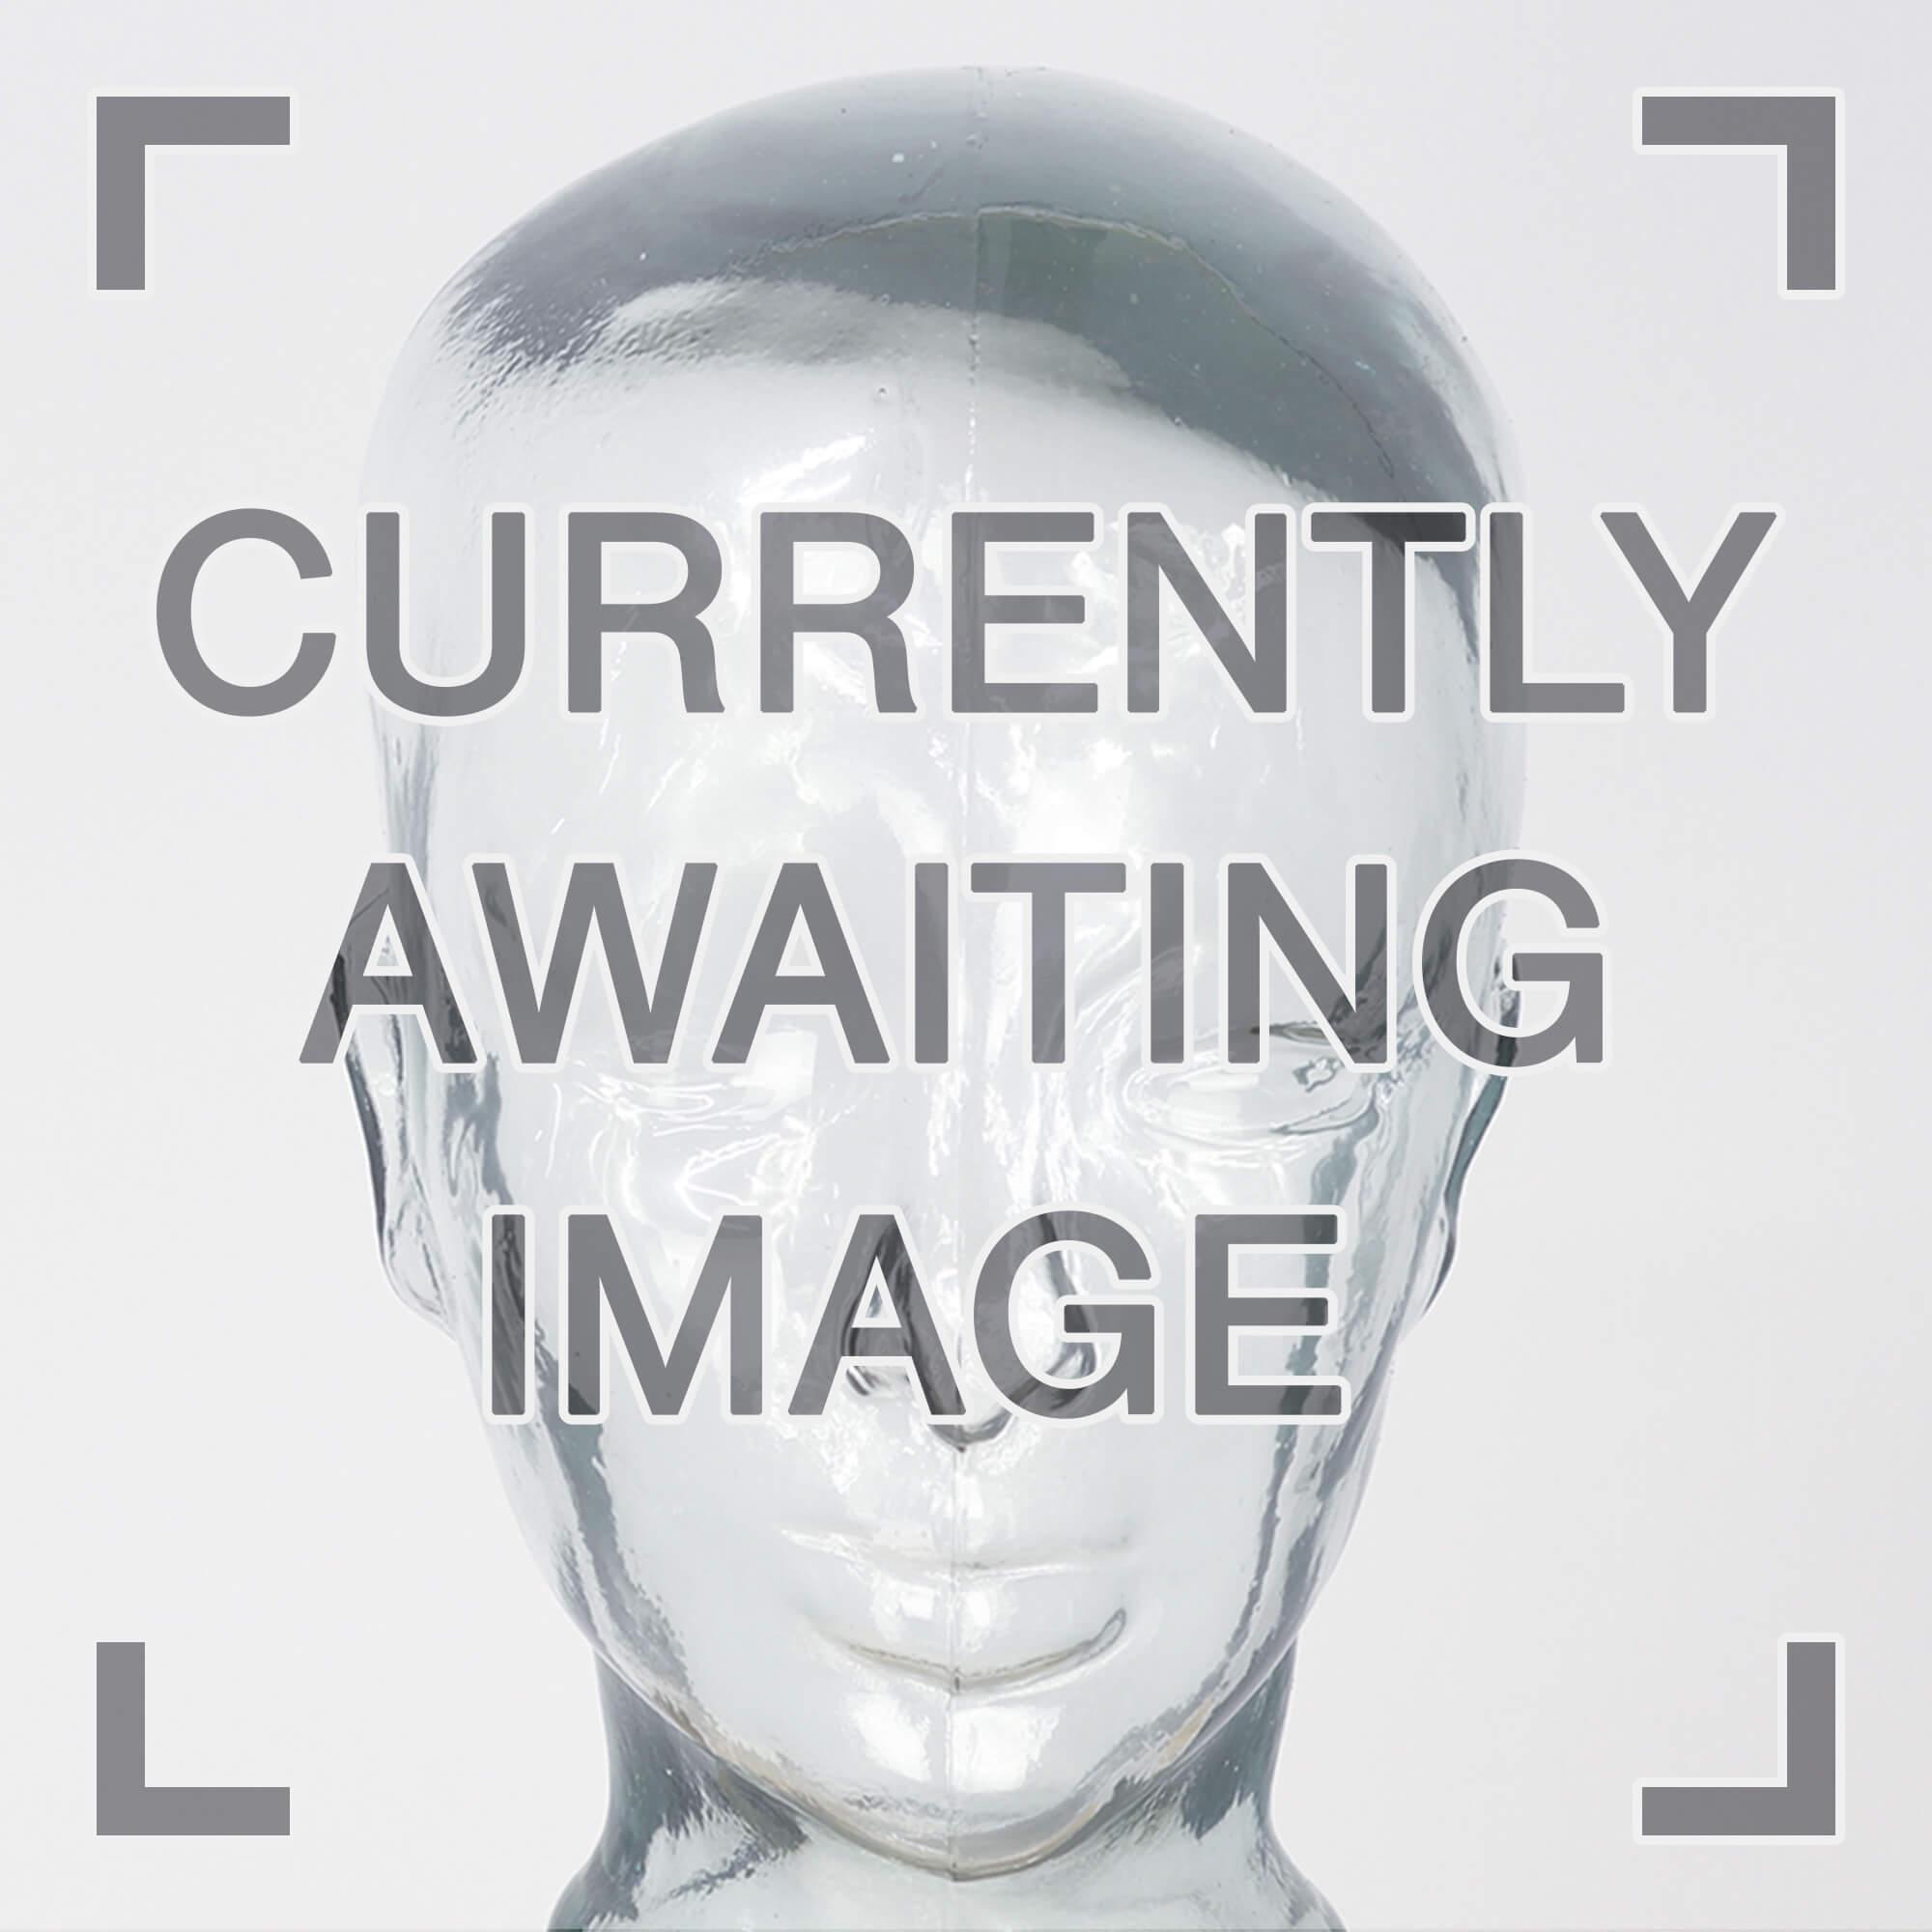 QII-Eighty Power Amplifier